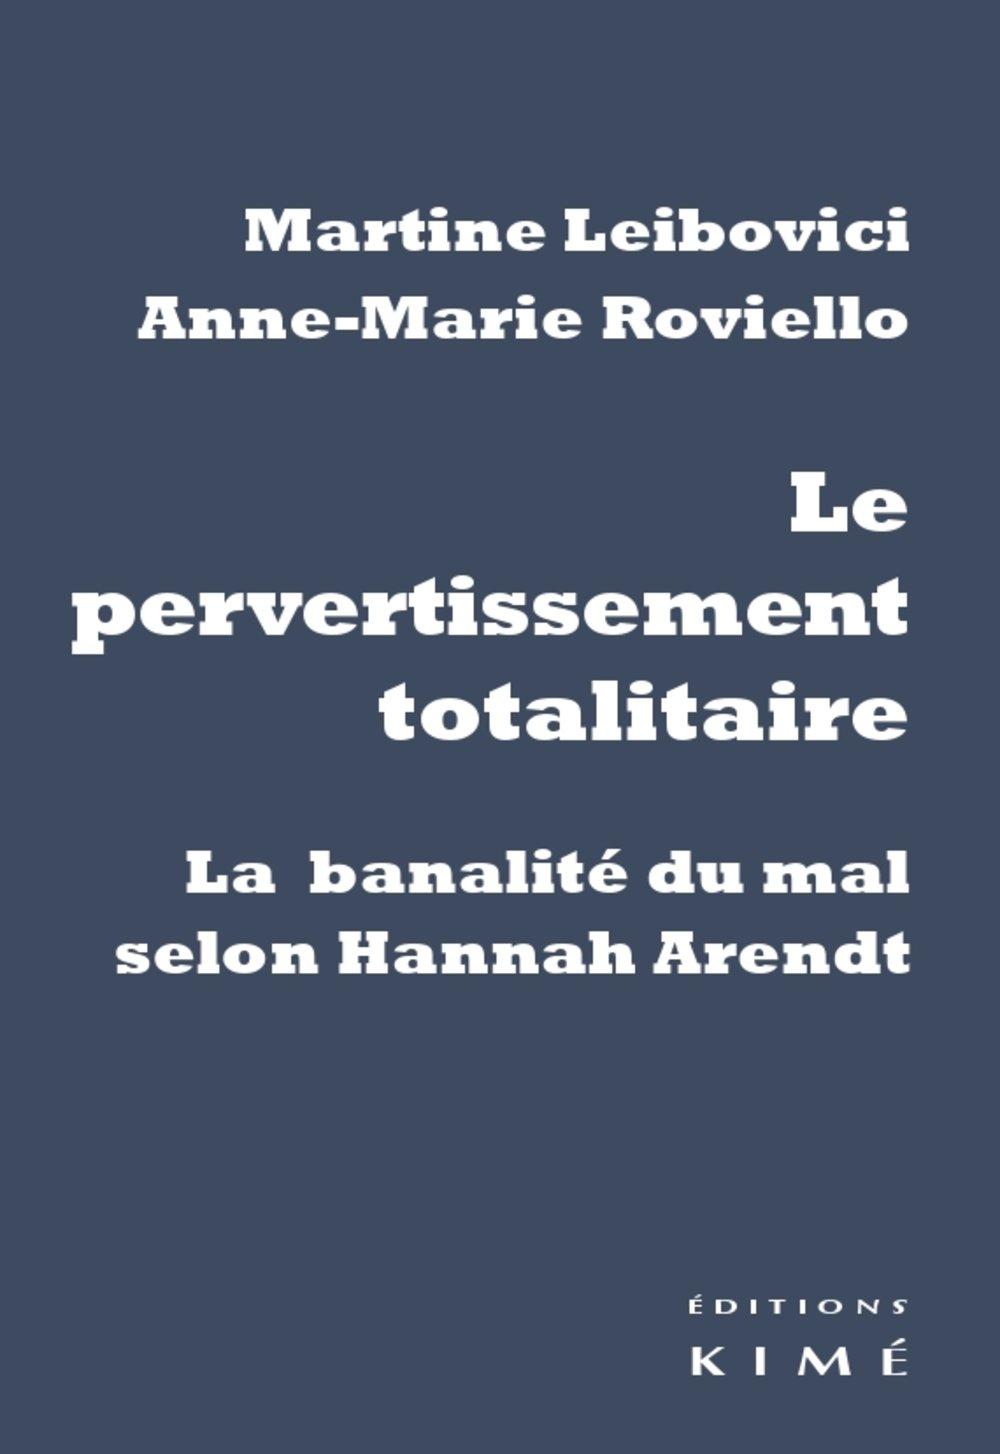 leibovici_pervertissement_totalitaire.jpg